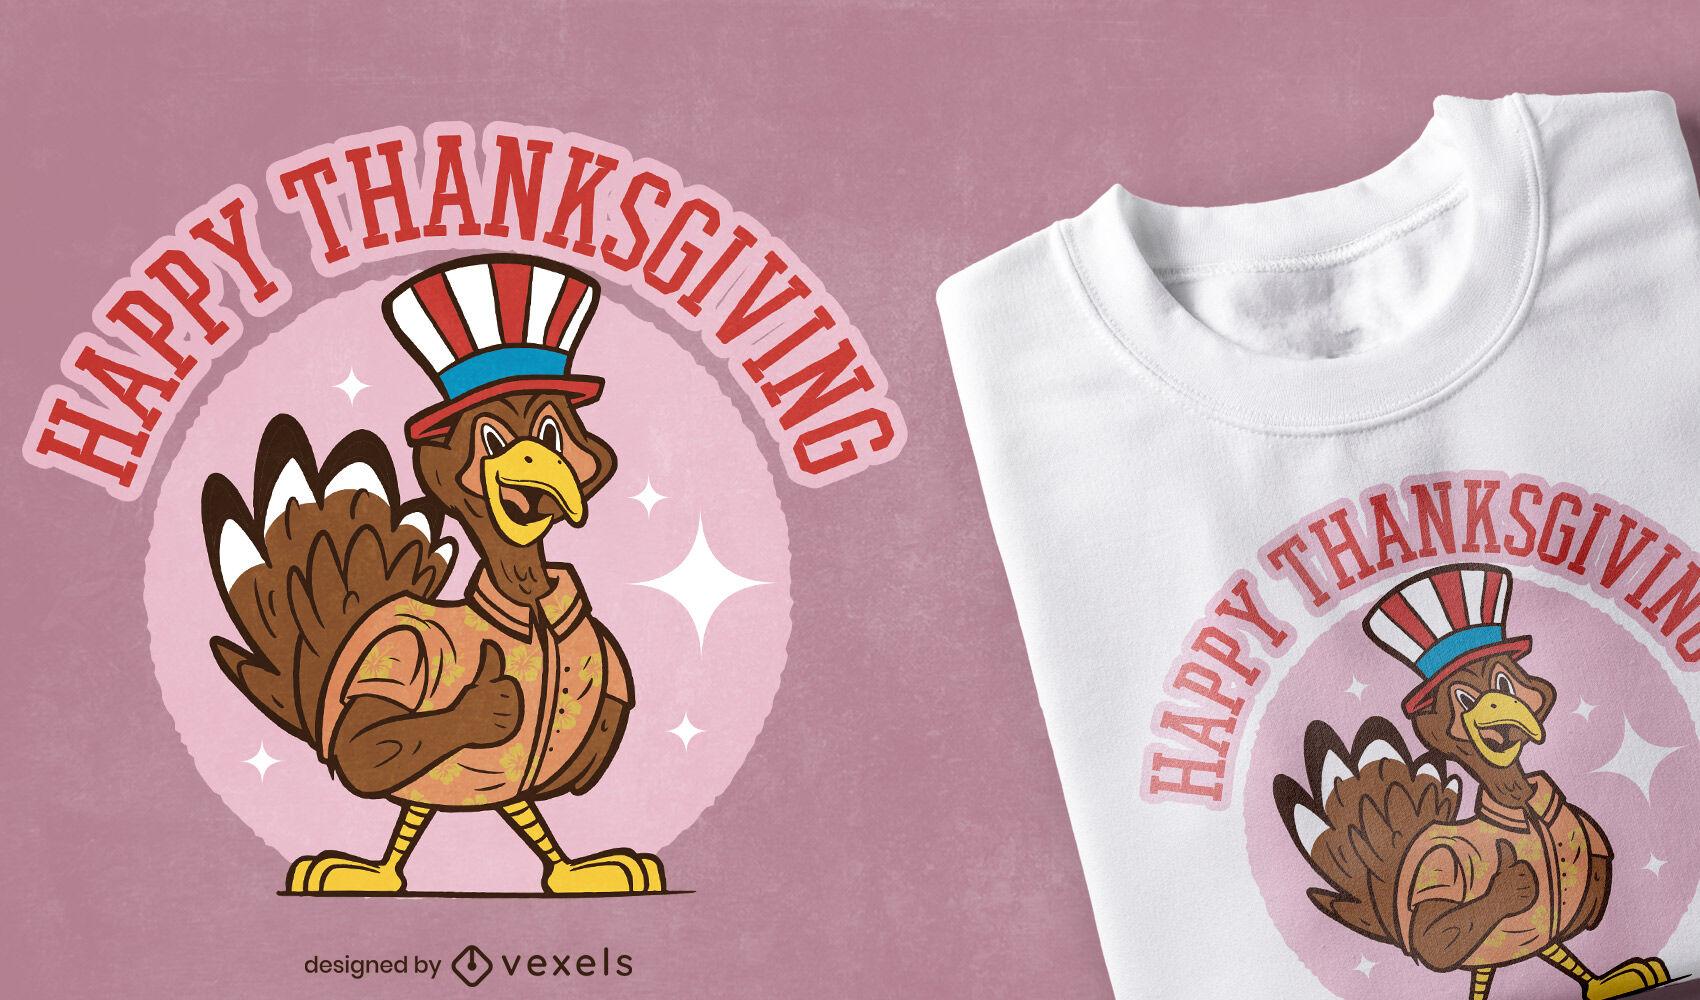 Patriot Thanksgiving t-shirt design